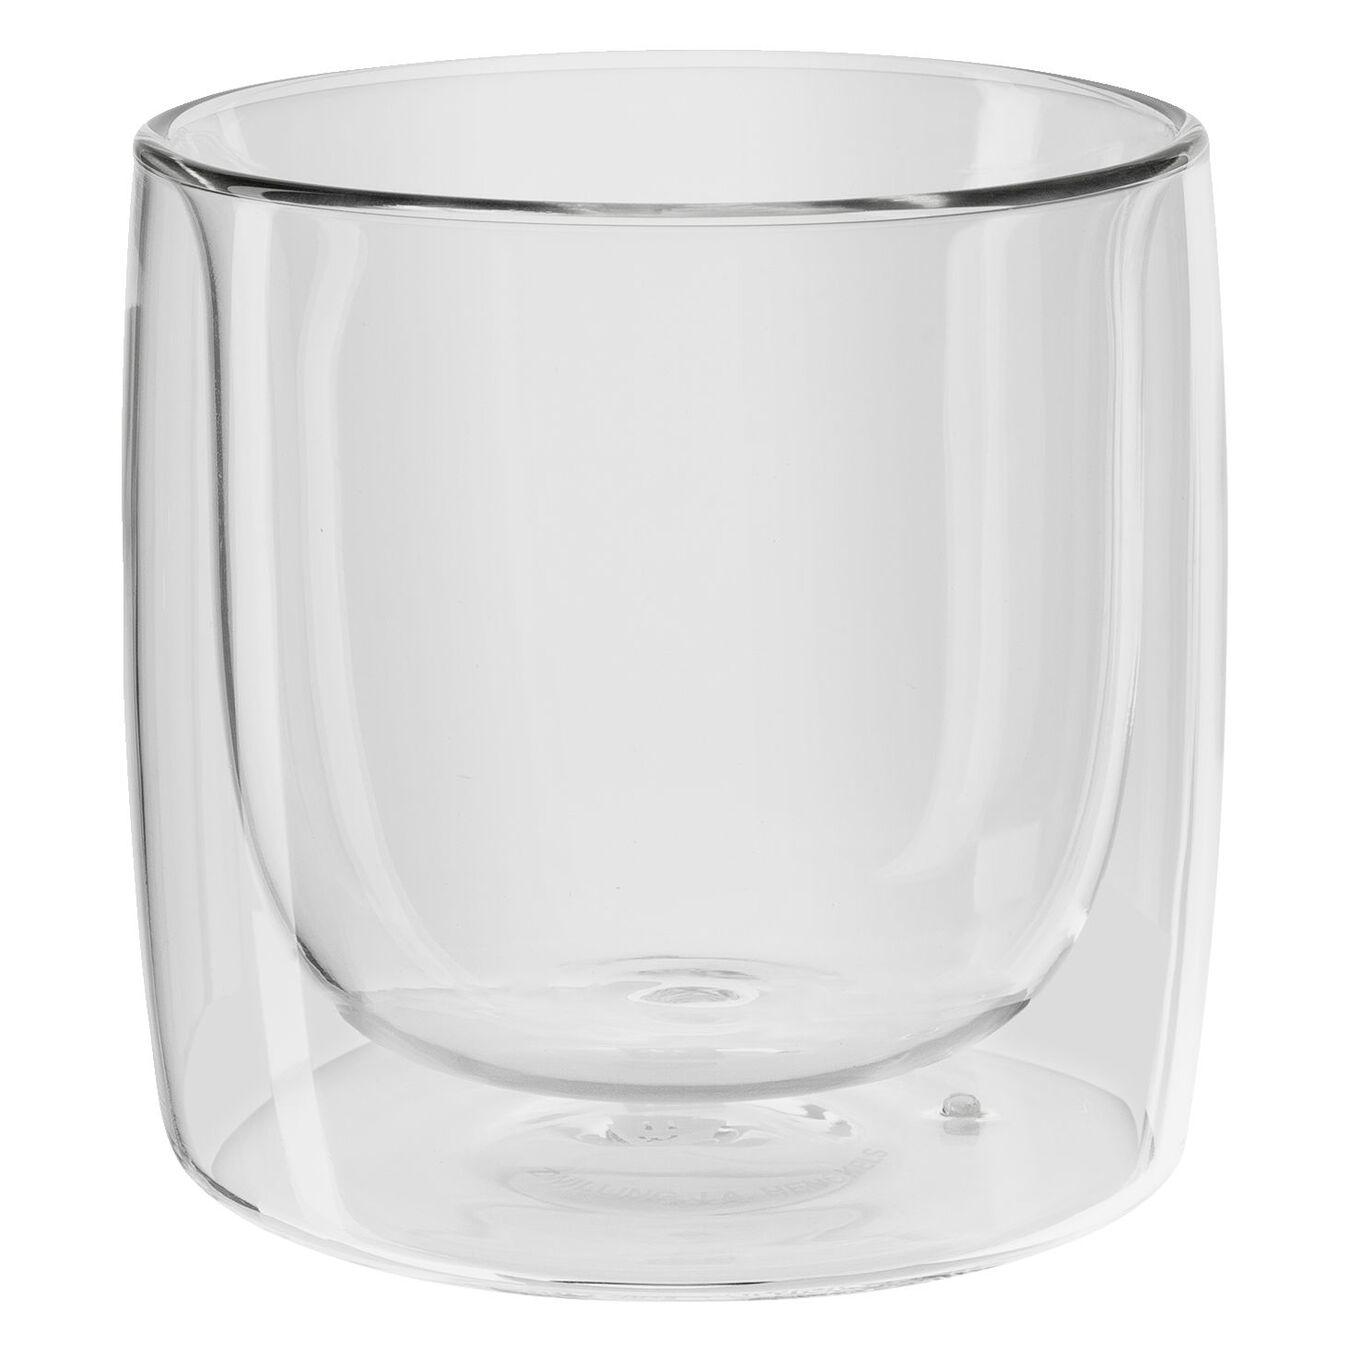 Set di bicchieri da whisky - 2-pz., vetro borosilicato,,large 1